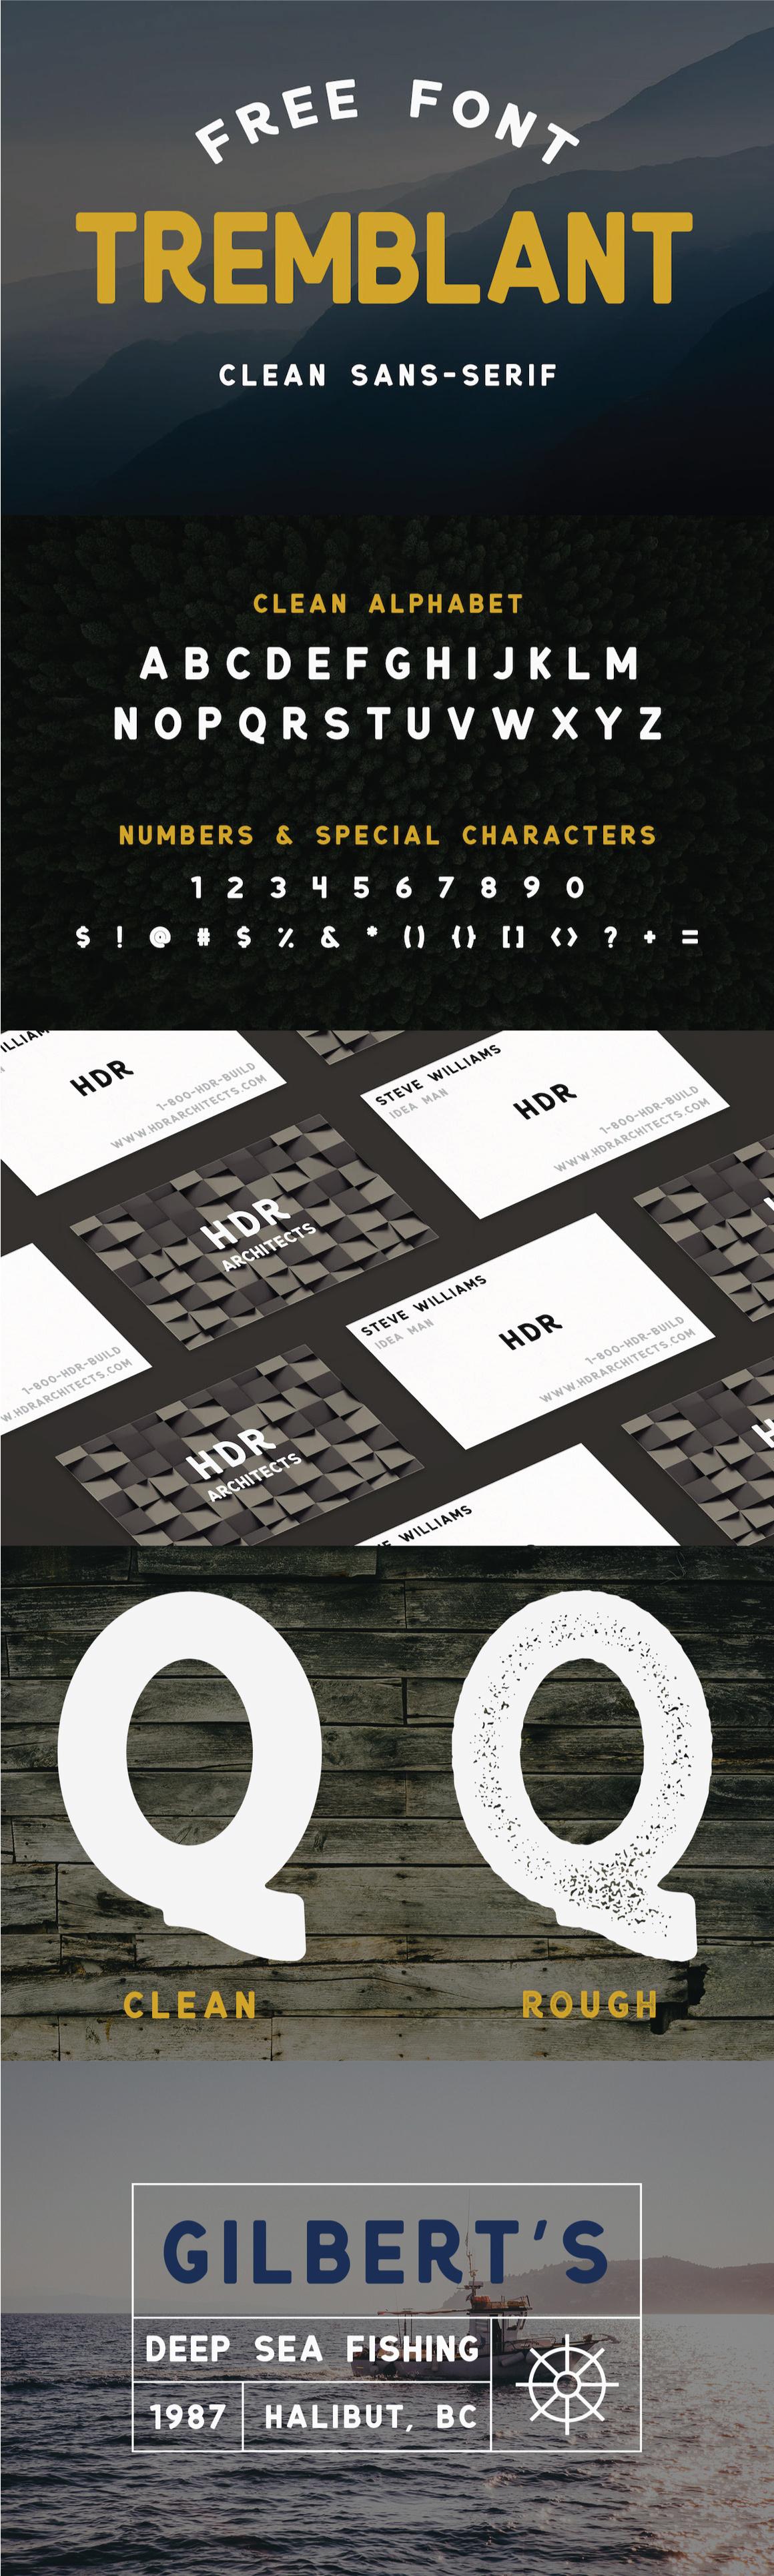 tremblant free font